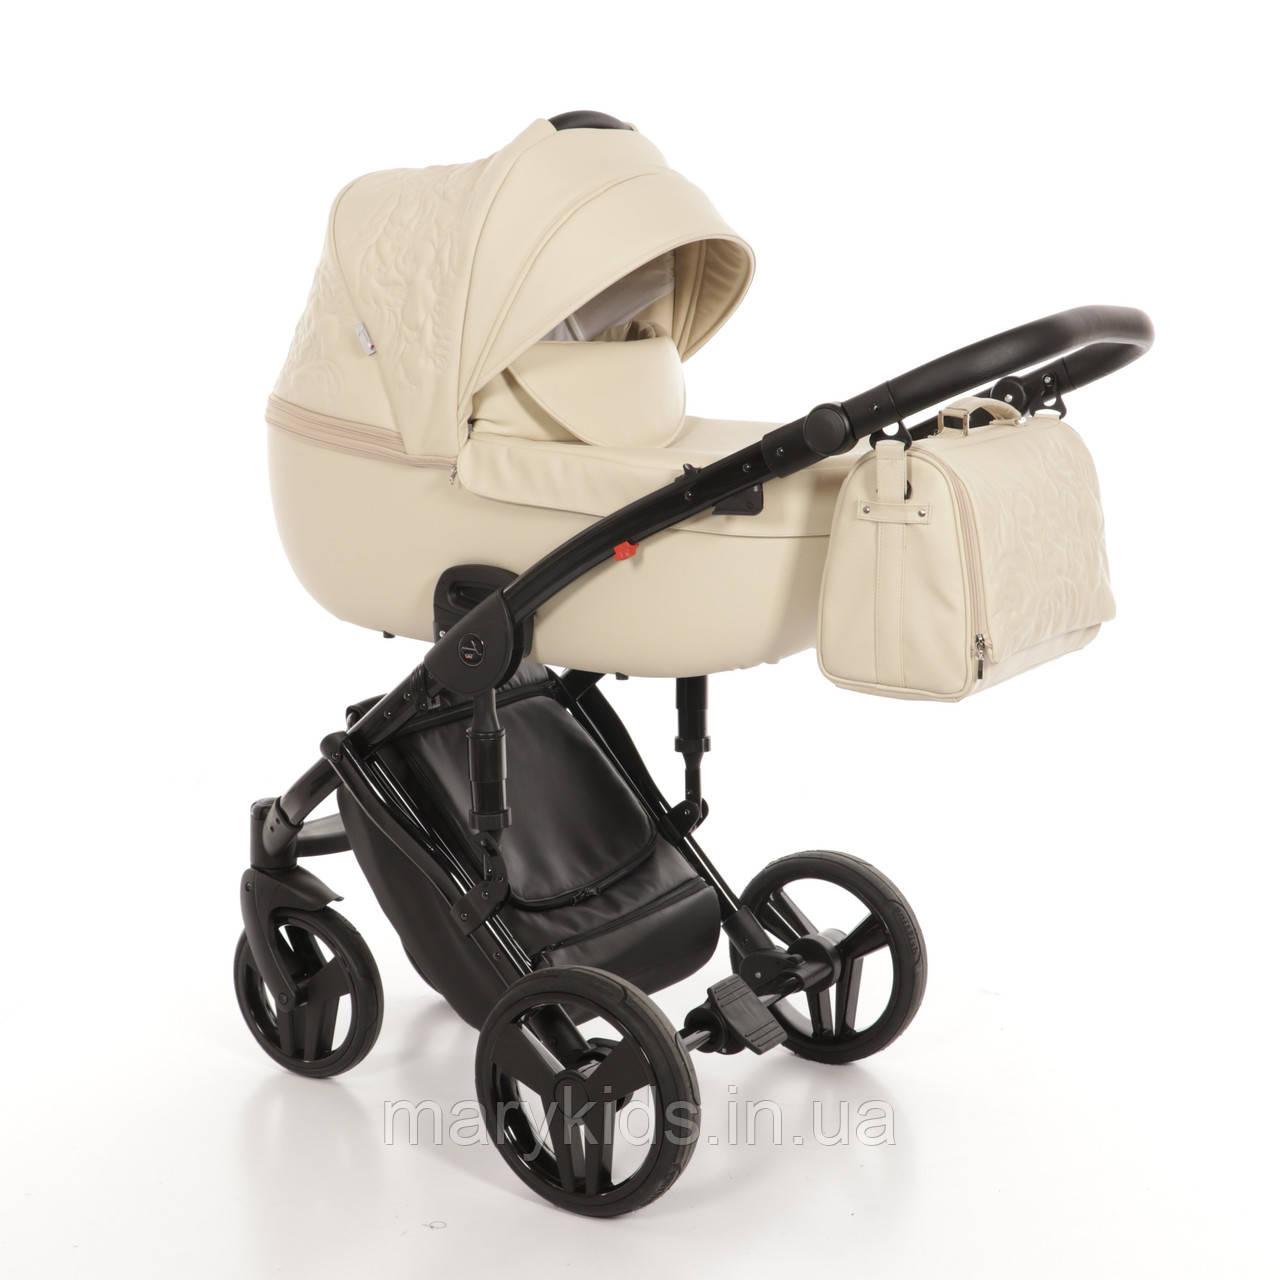 Дитяча універсальна коляска 2 в 1 Junama Enzo 02